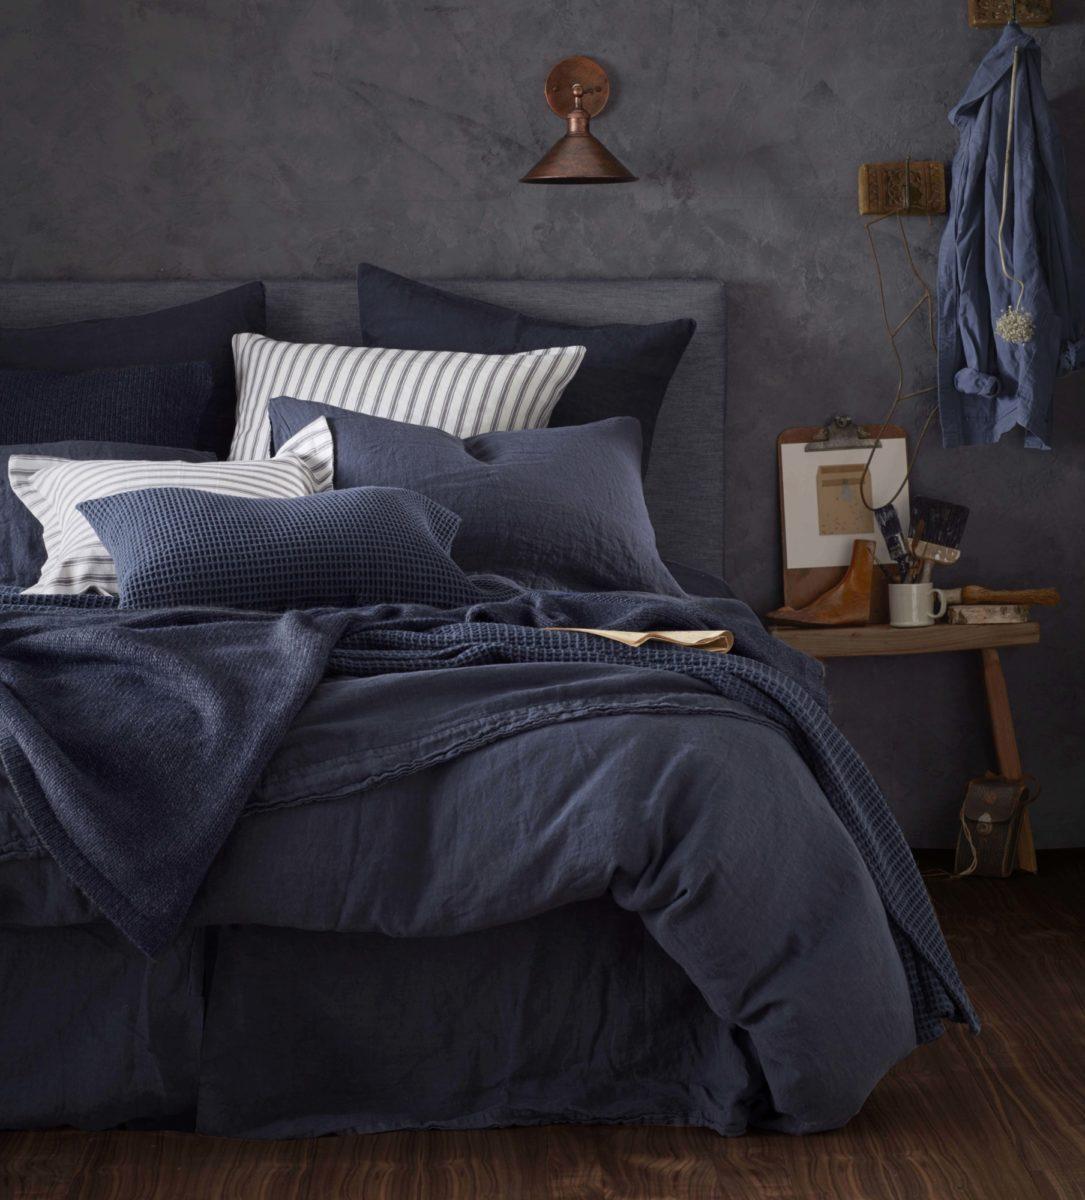 navy 100 linen duvet cover natural bedding secret linen store